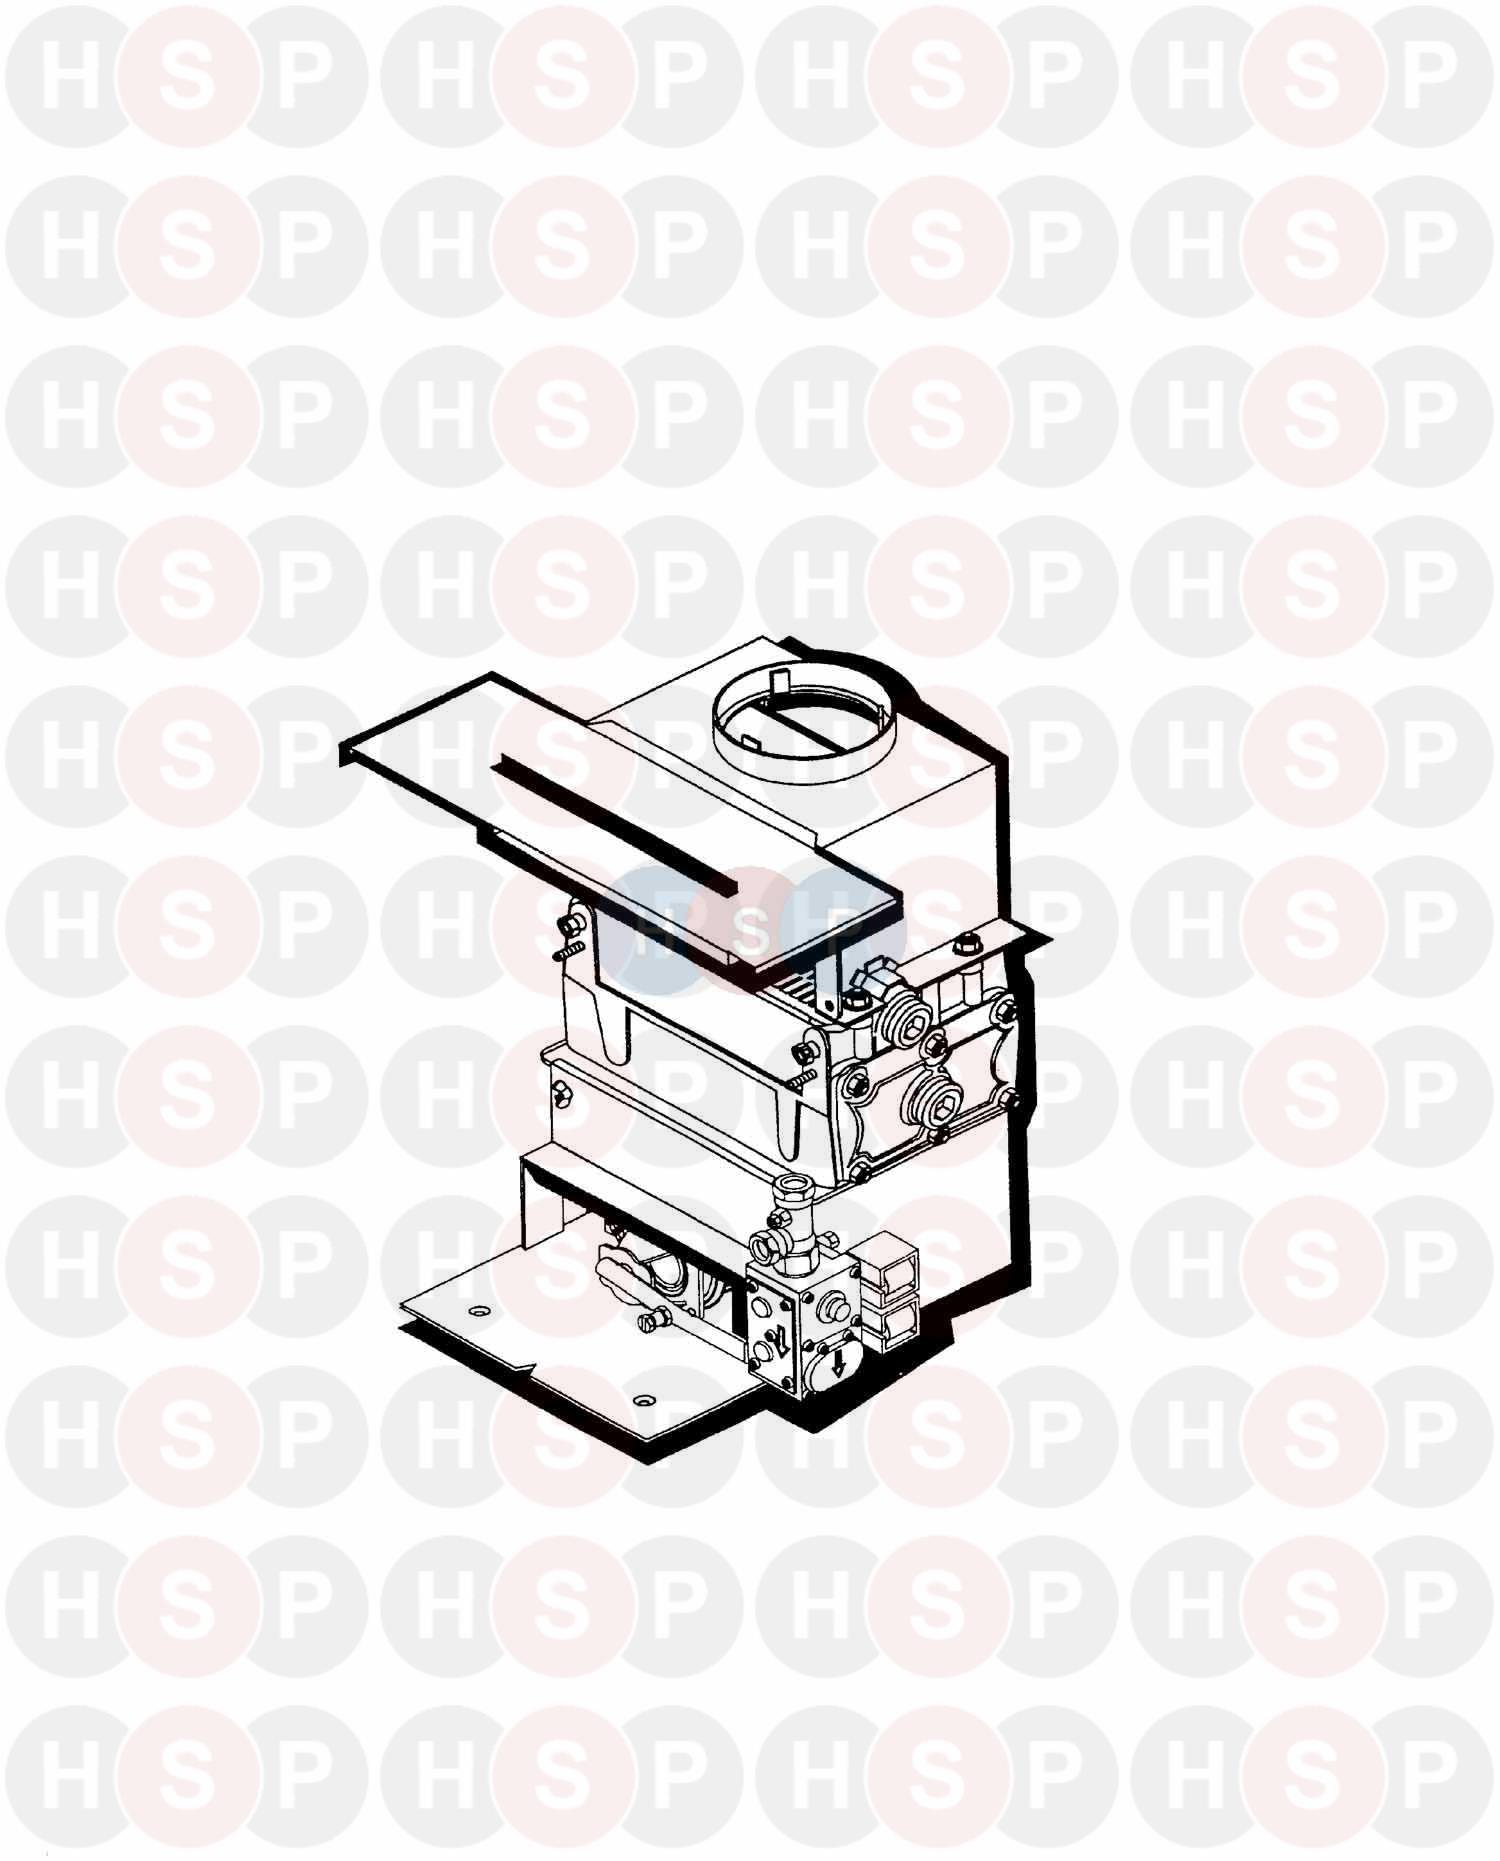 Potterton HOUSEWARMER 45 (APPLIANCE OVERVIEW) Diagram